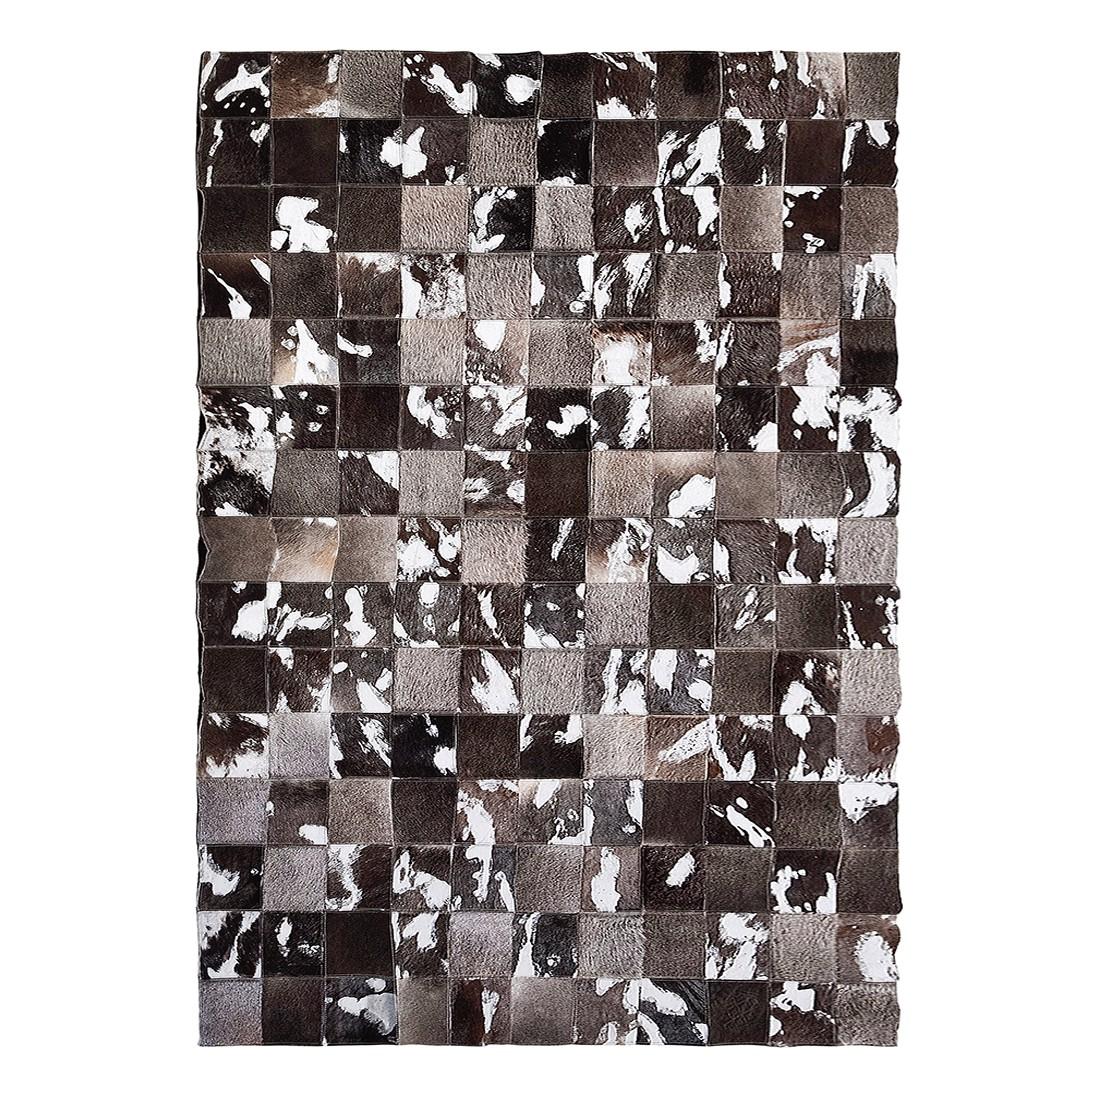 Teppich Cosmo Grey Fur - Kuhfell Grau - 300 cm x 200 cm, Kare Design